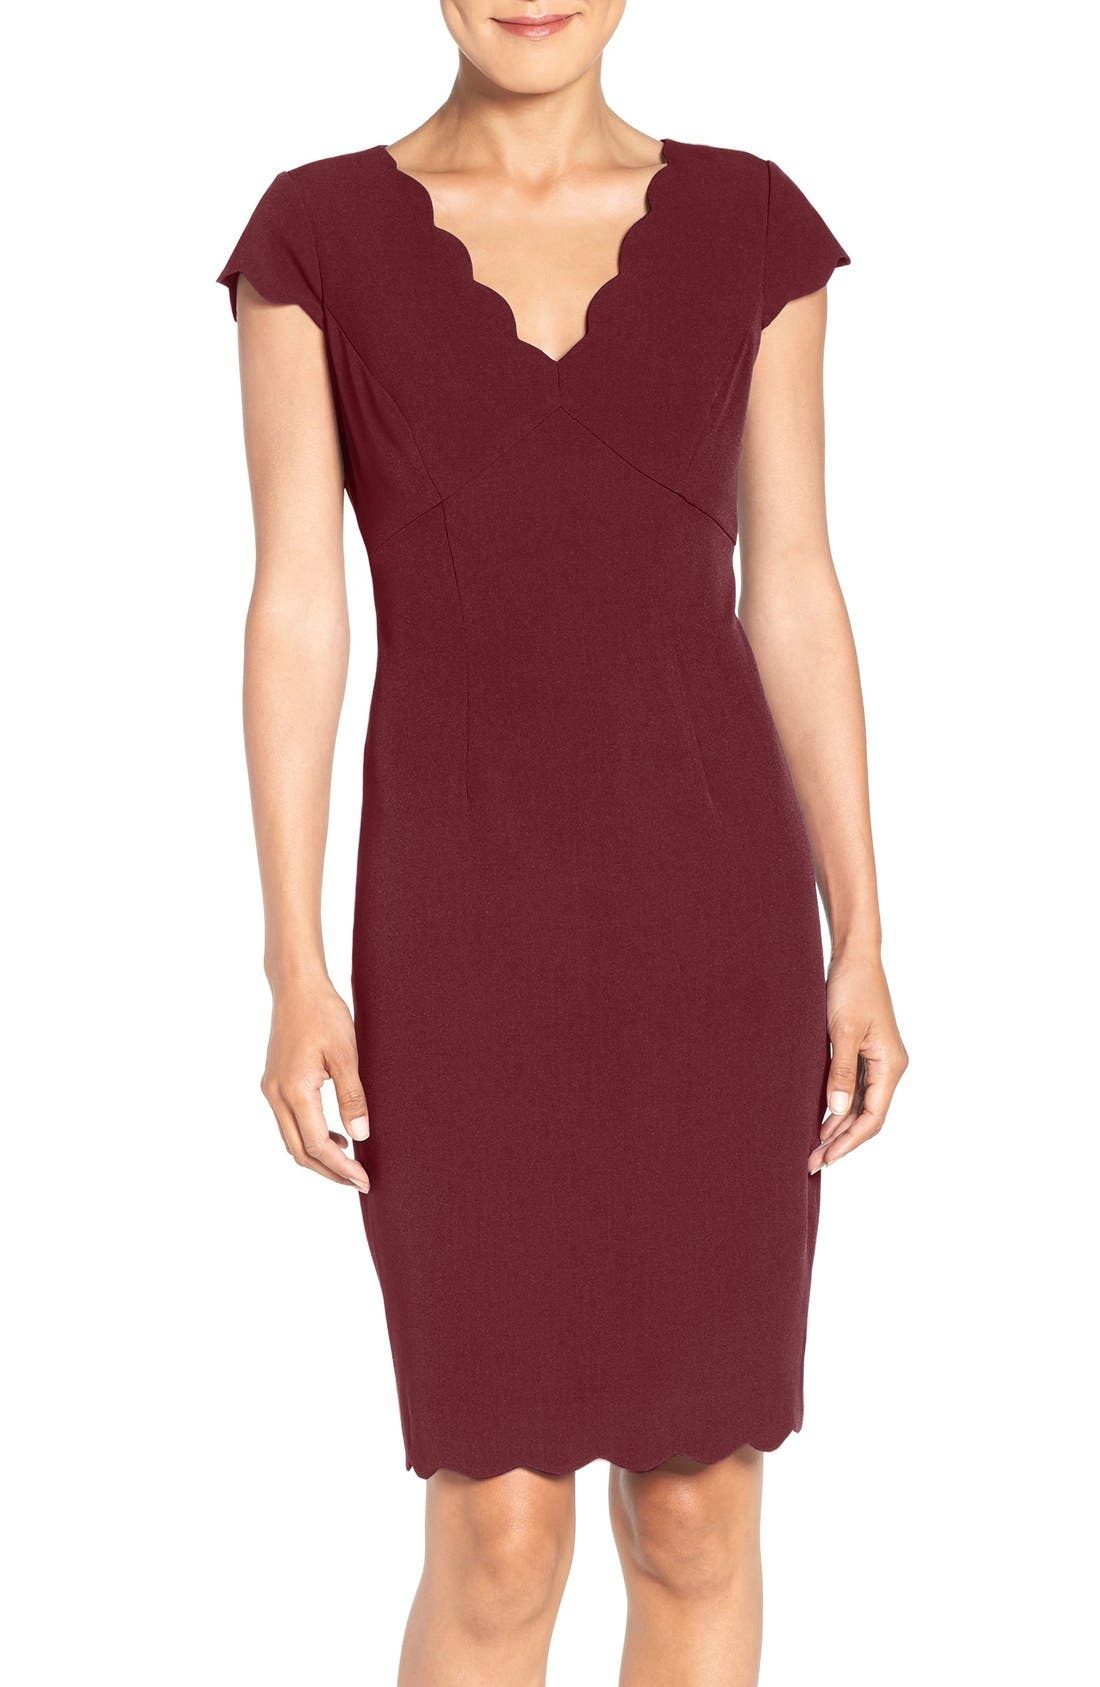 Alternate Image 1 Selected - Adrianna Papell Scalloped Crepe Sheath Dress (Regular & Petite)